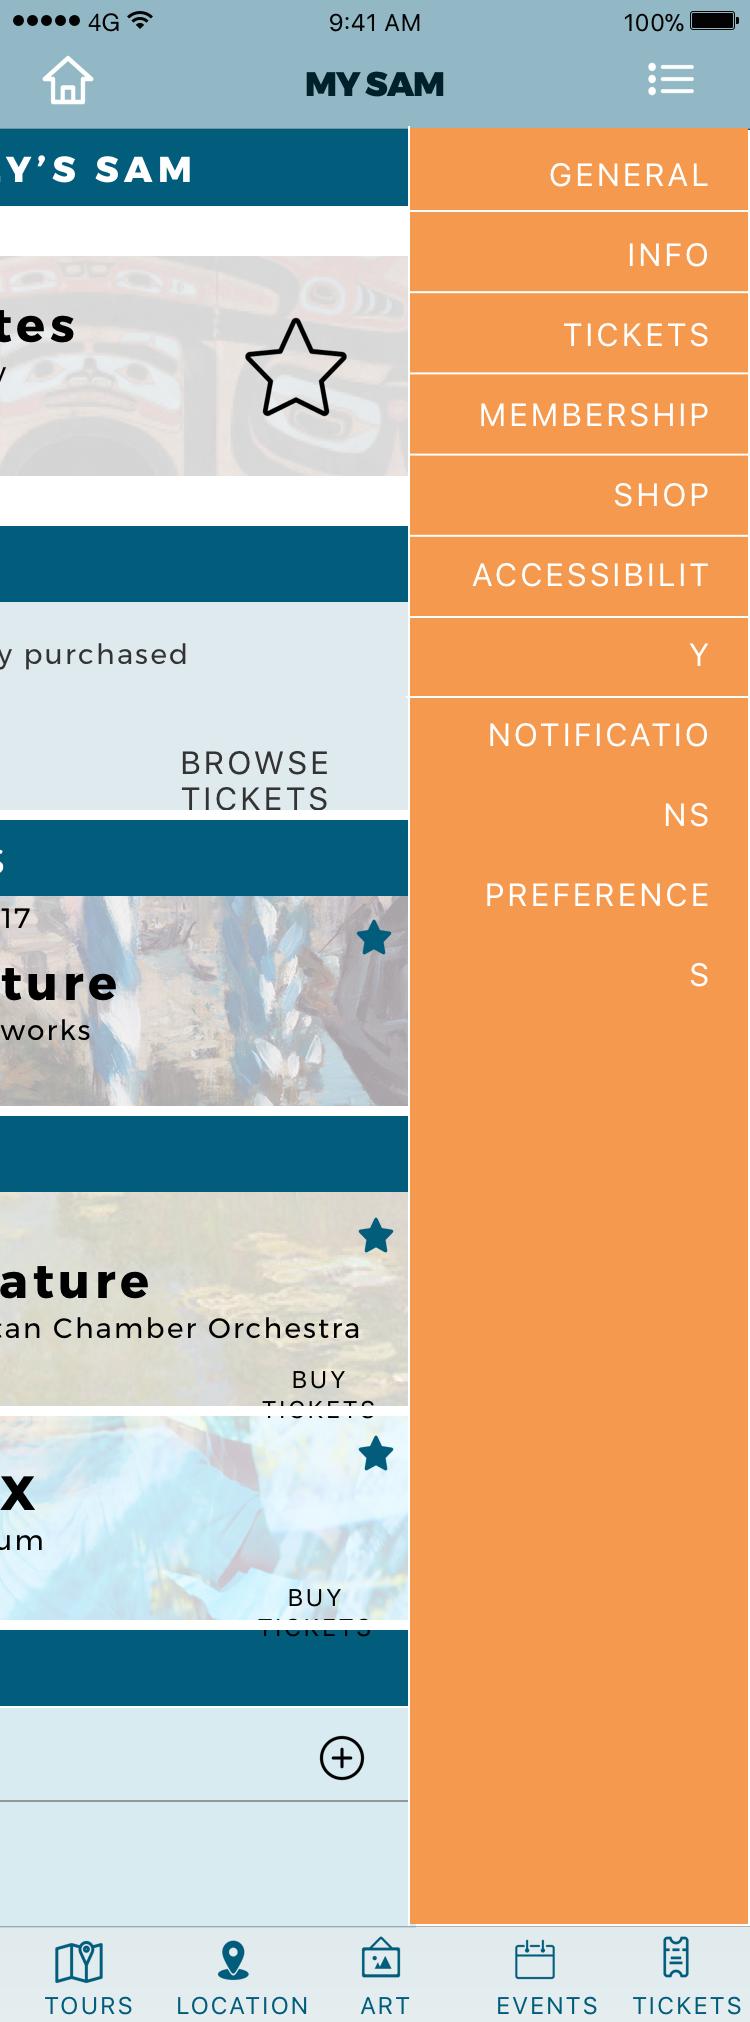 08_MYSAM_homepage_menuexposed.png